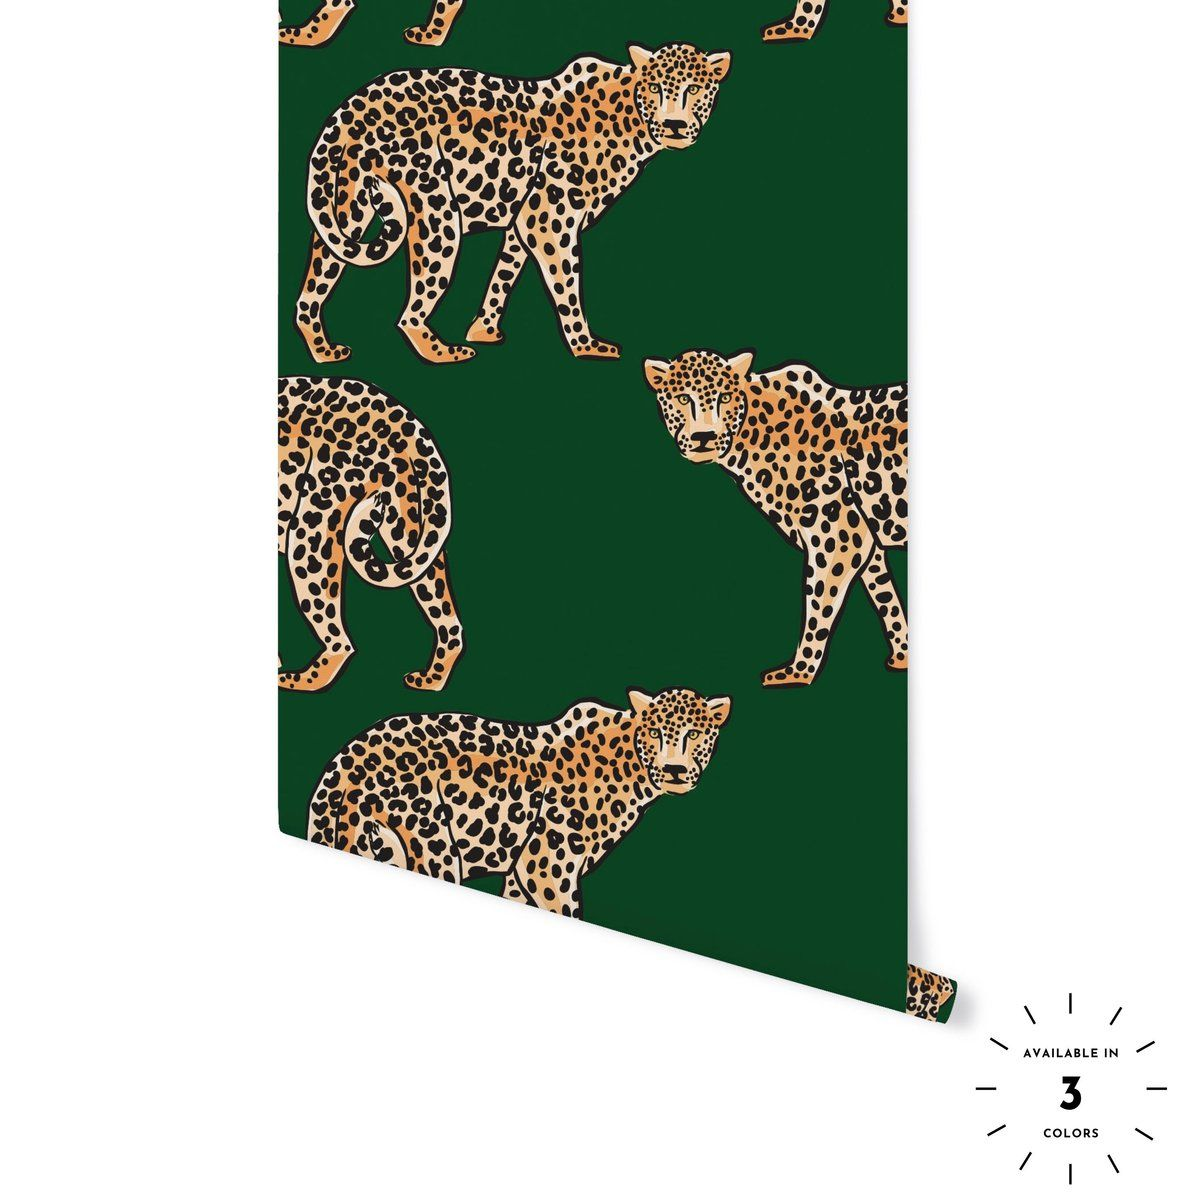 Jungle Leopard Cheetah Print Wallpaper Leopard Wallpaper Peel And Stick Wallpaper